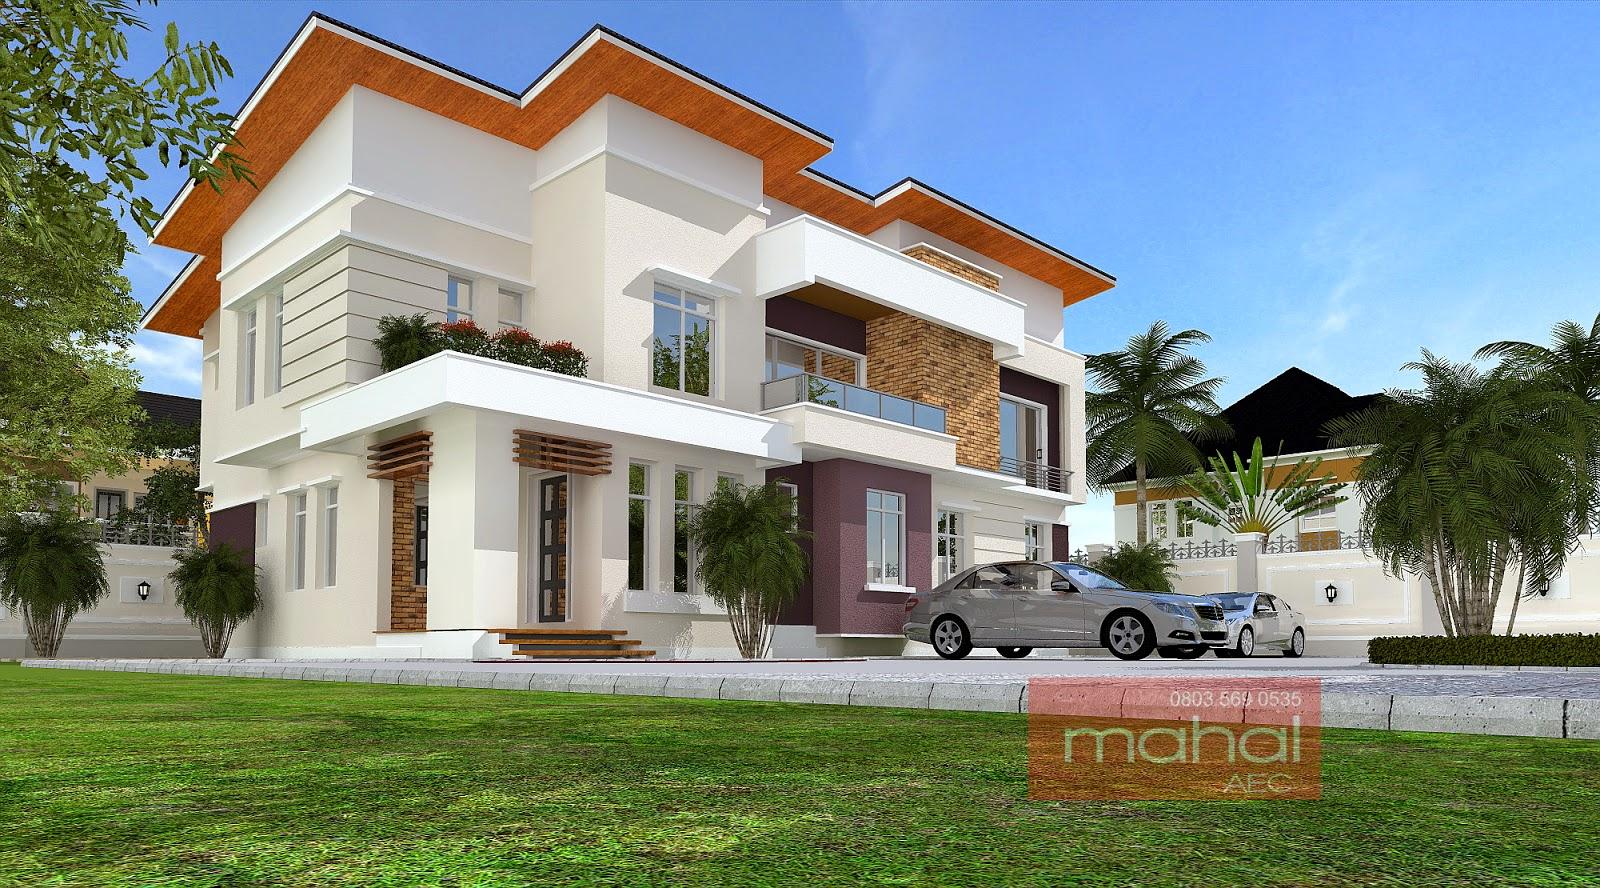 Contemporary Nigerian Residential Architecture: C.Ohio House